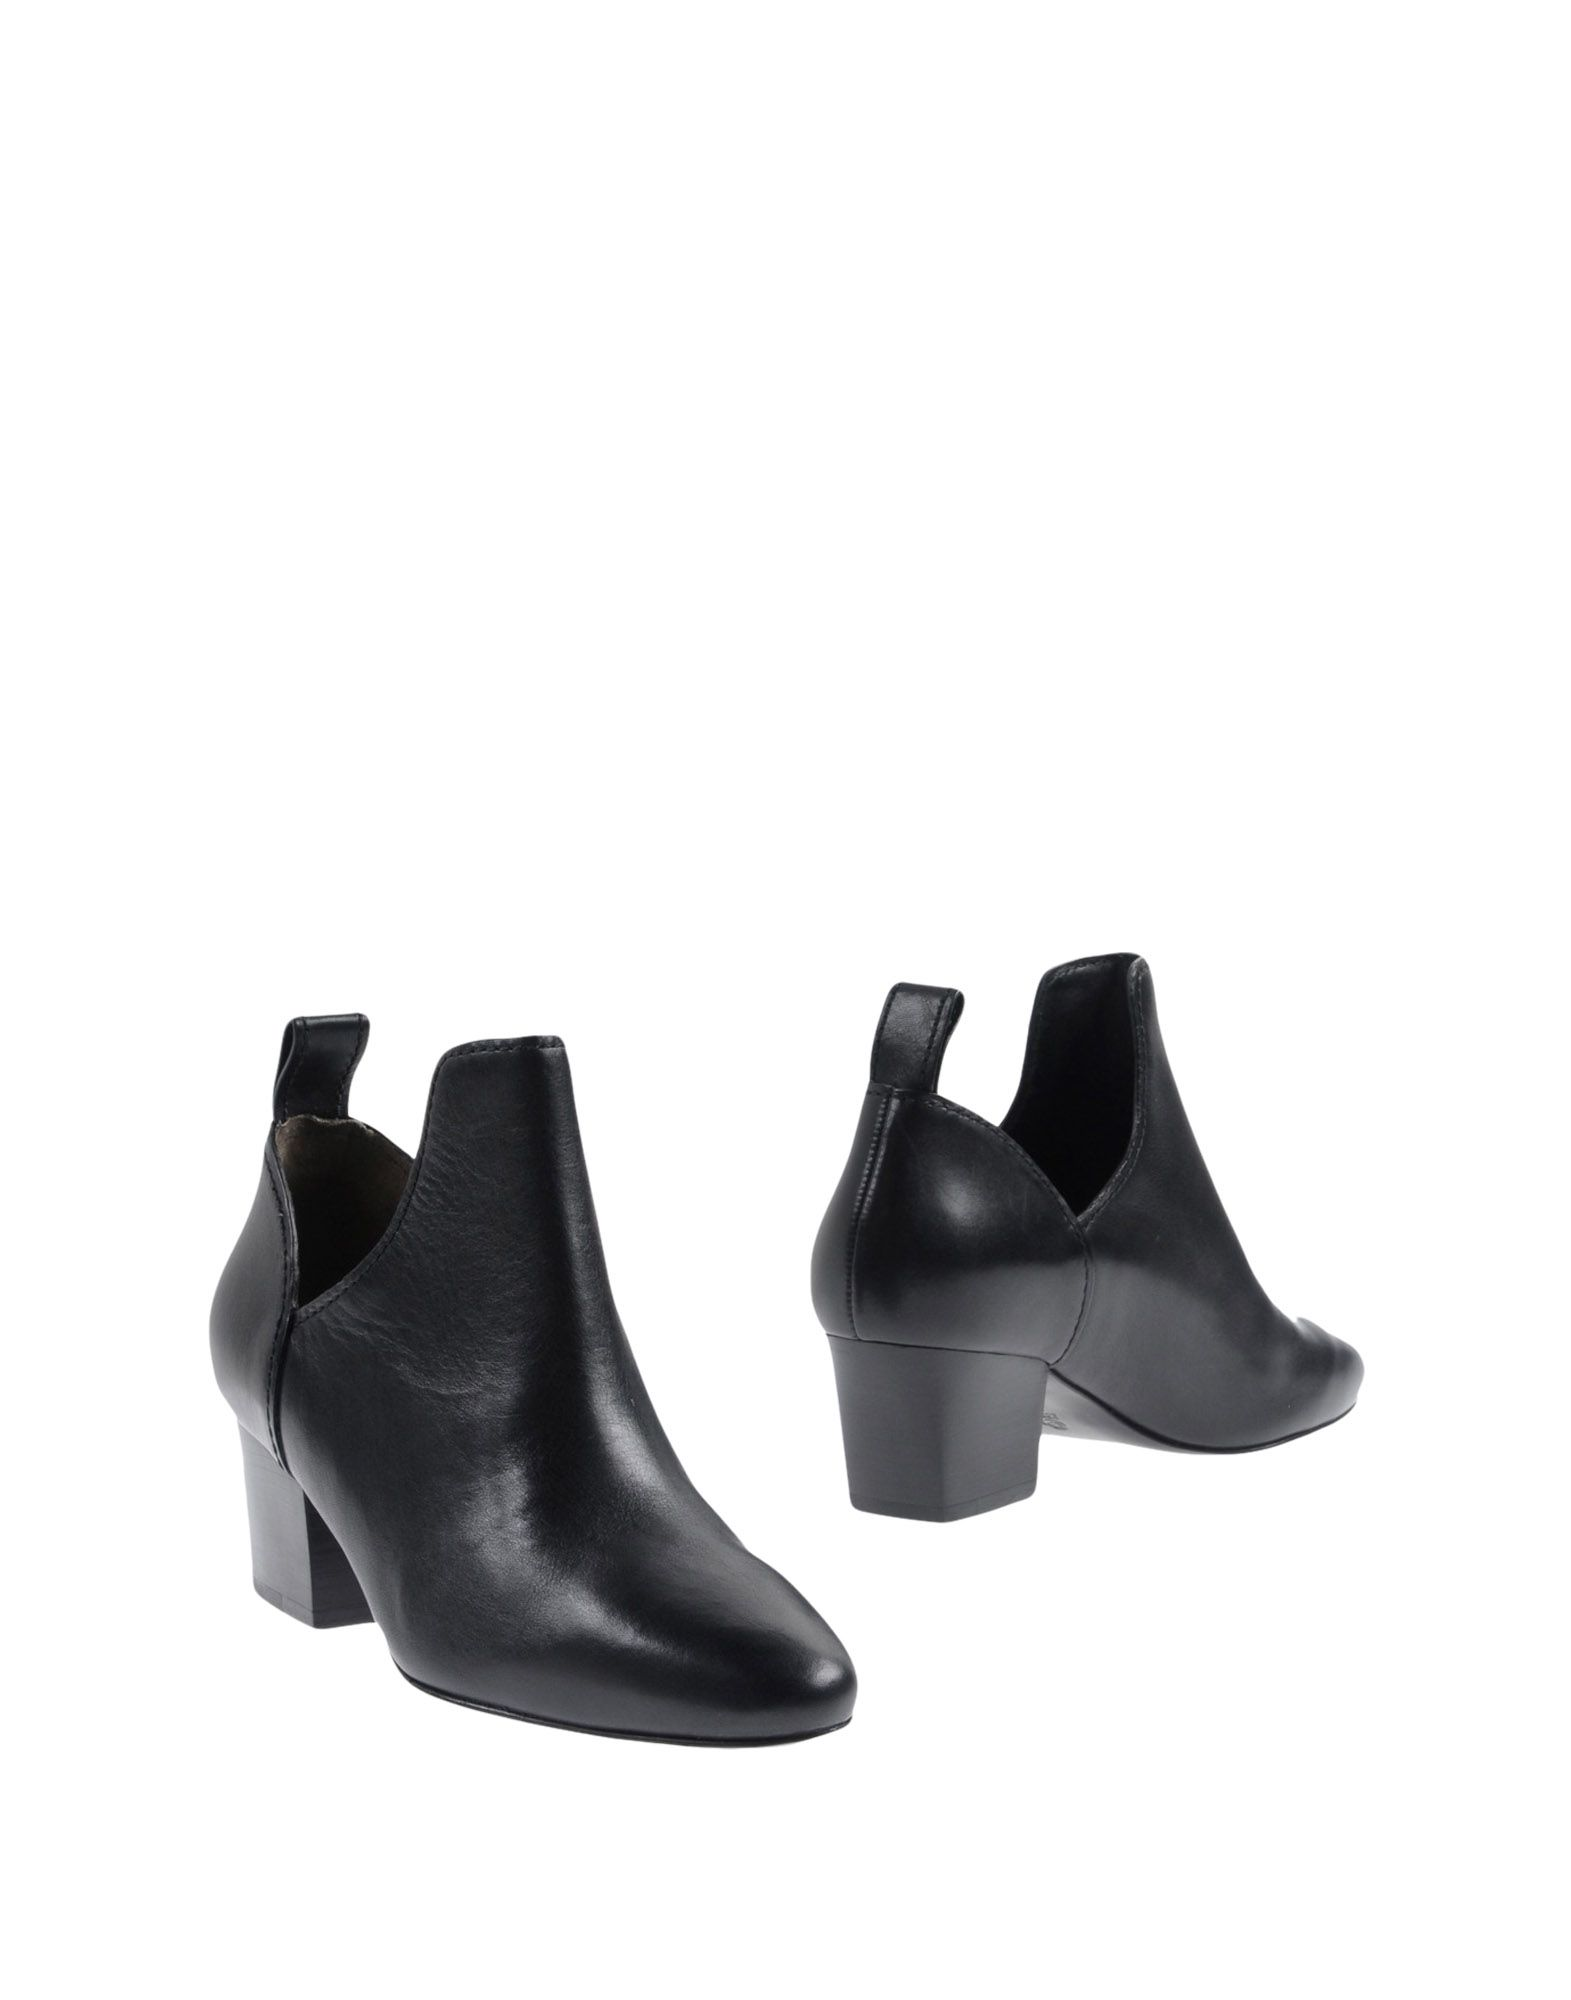 3.1 Phillip Lim Schuhe Stiefelette Damen  11434455QJ Neue Schuhe Lim 27bb72